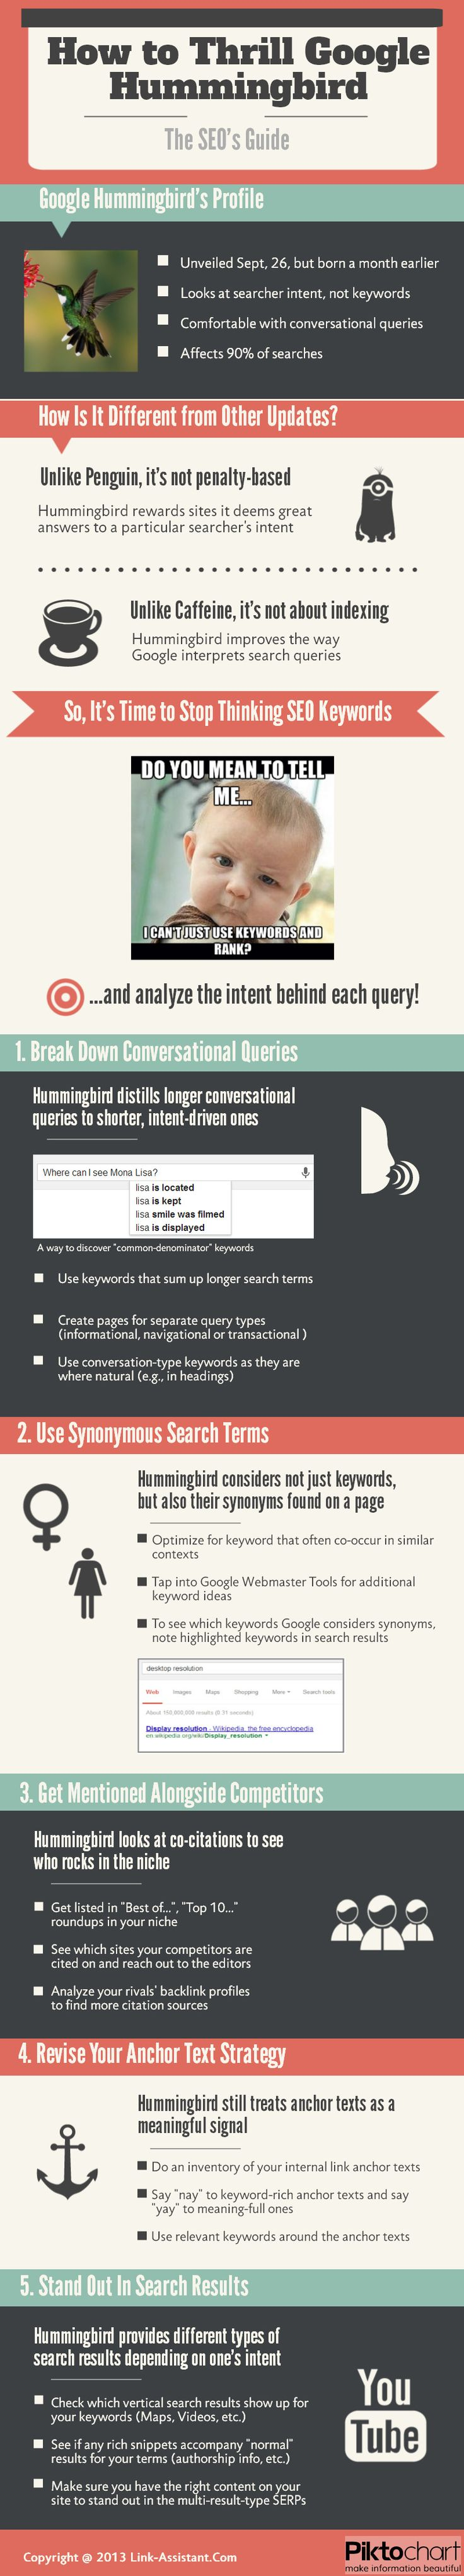 infographie google hummingbird